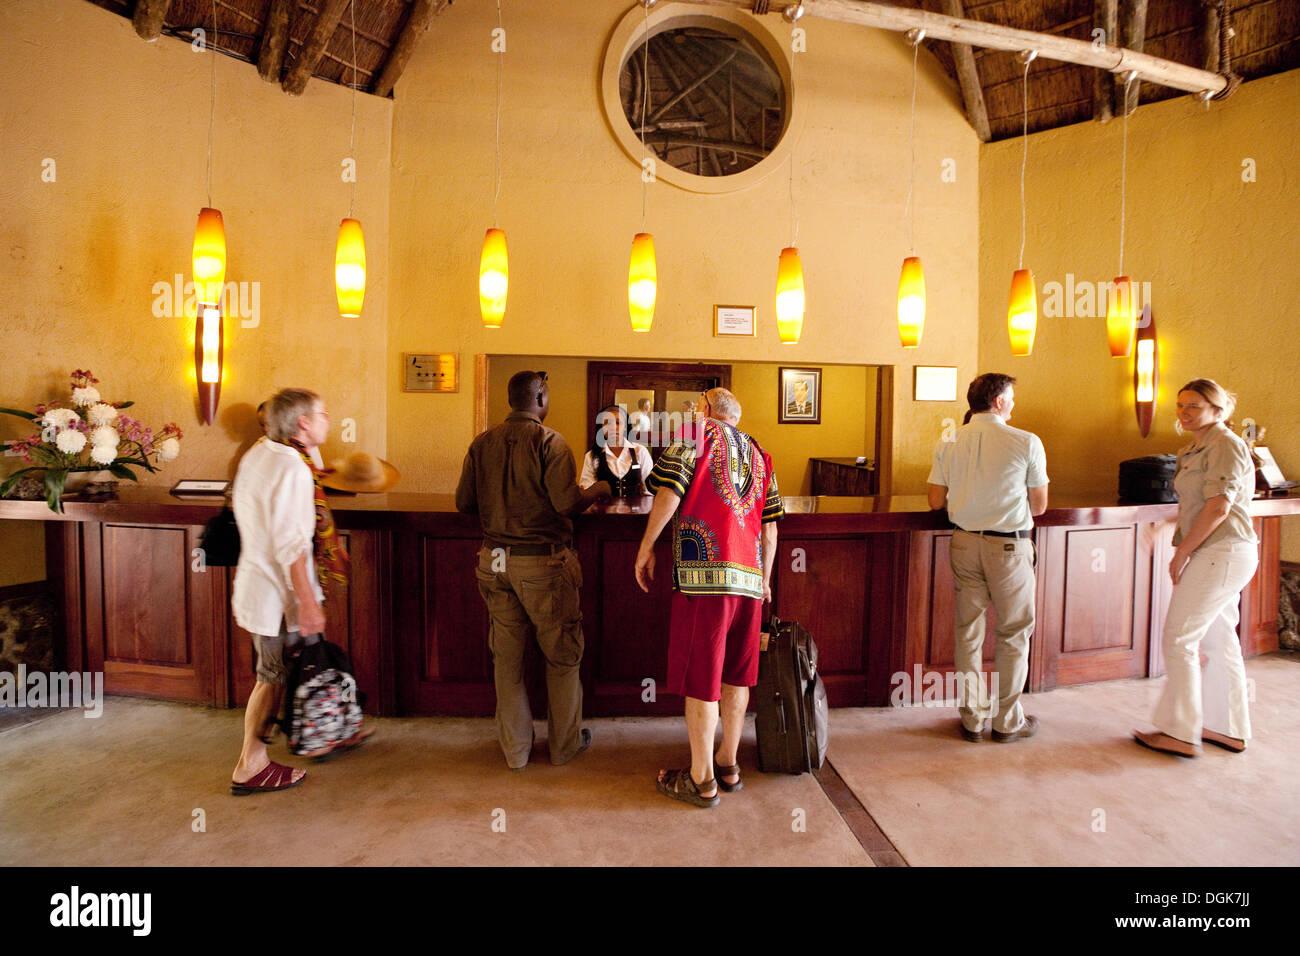 Reception desk, Chobe Safari Lodge Hotel, Chobe National Park Botswana, Africa - Stock Image